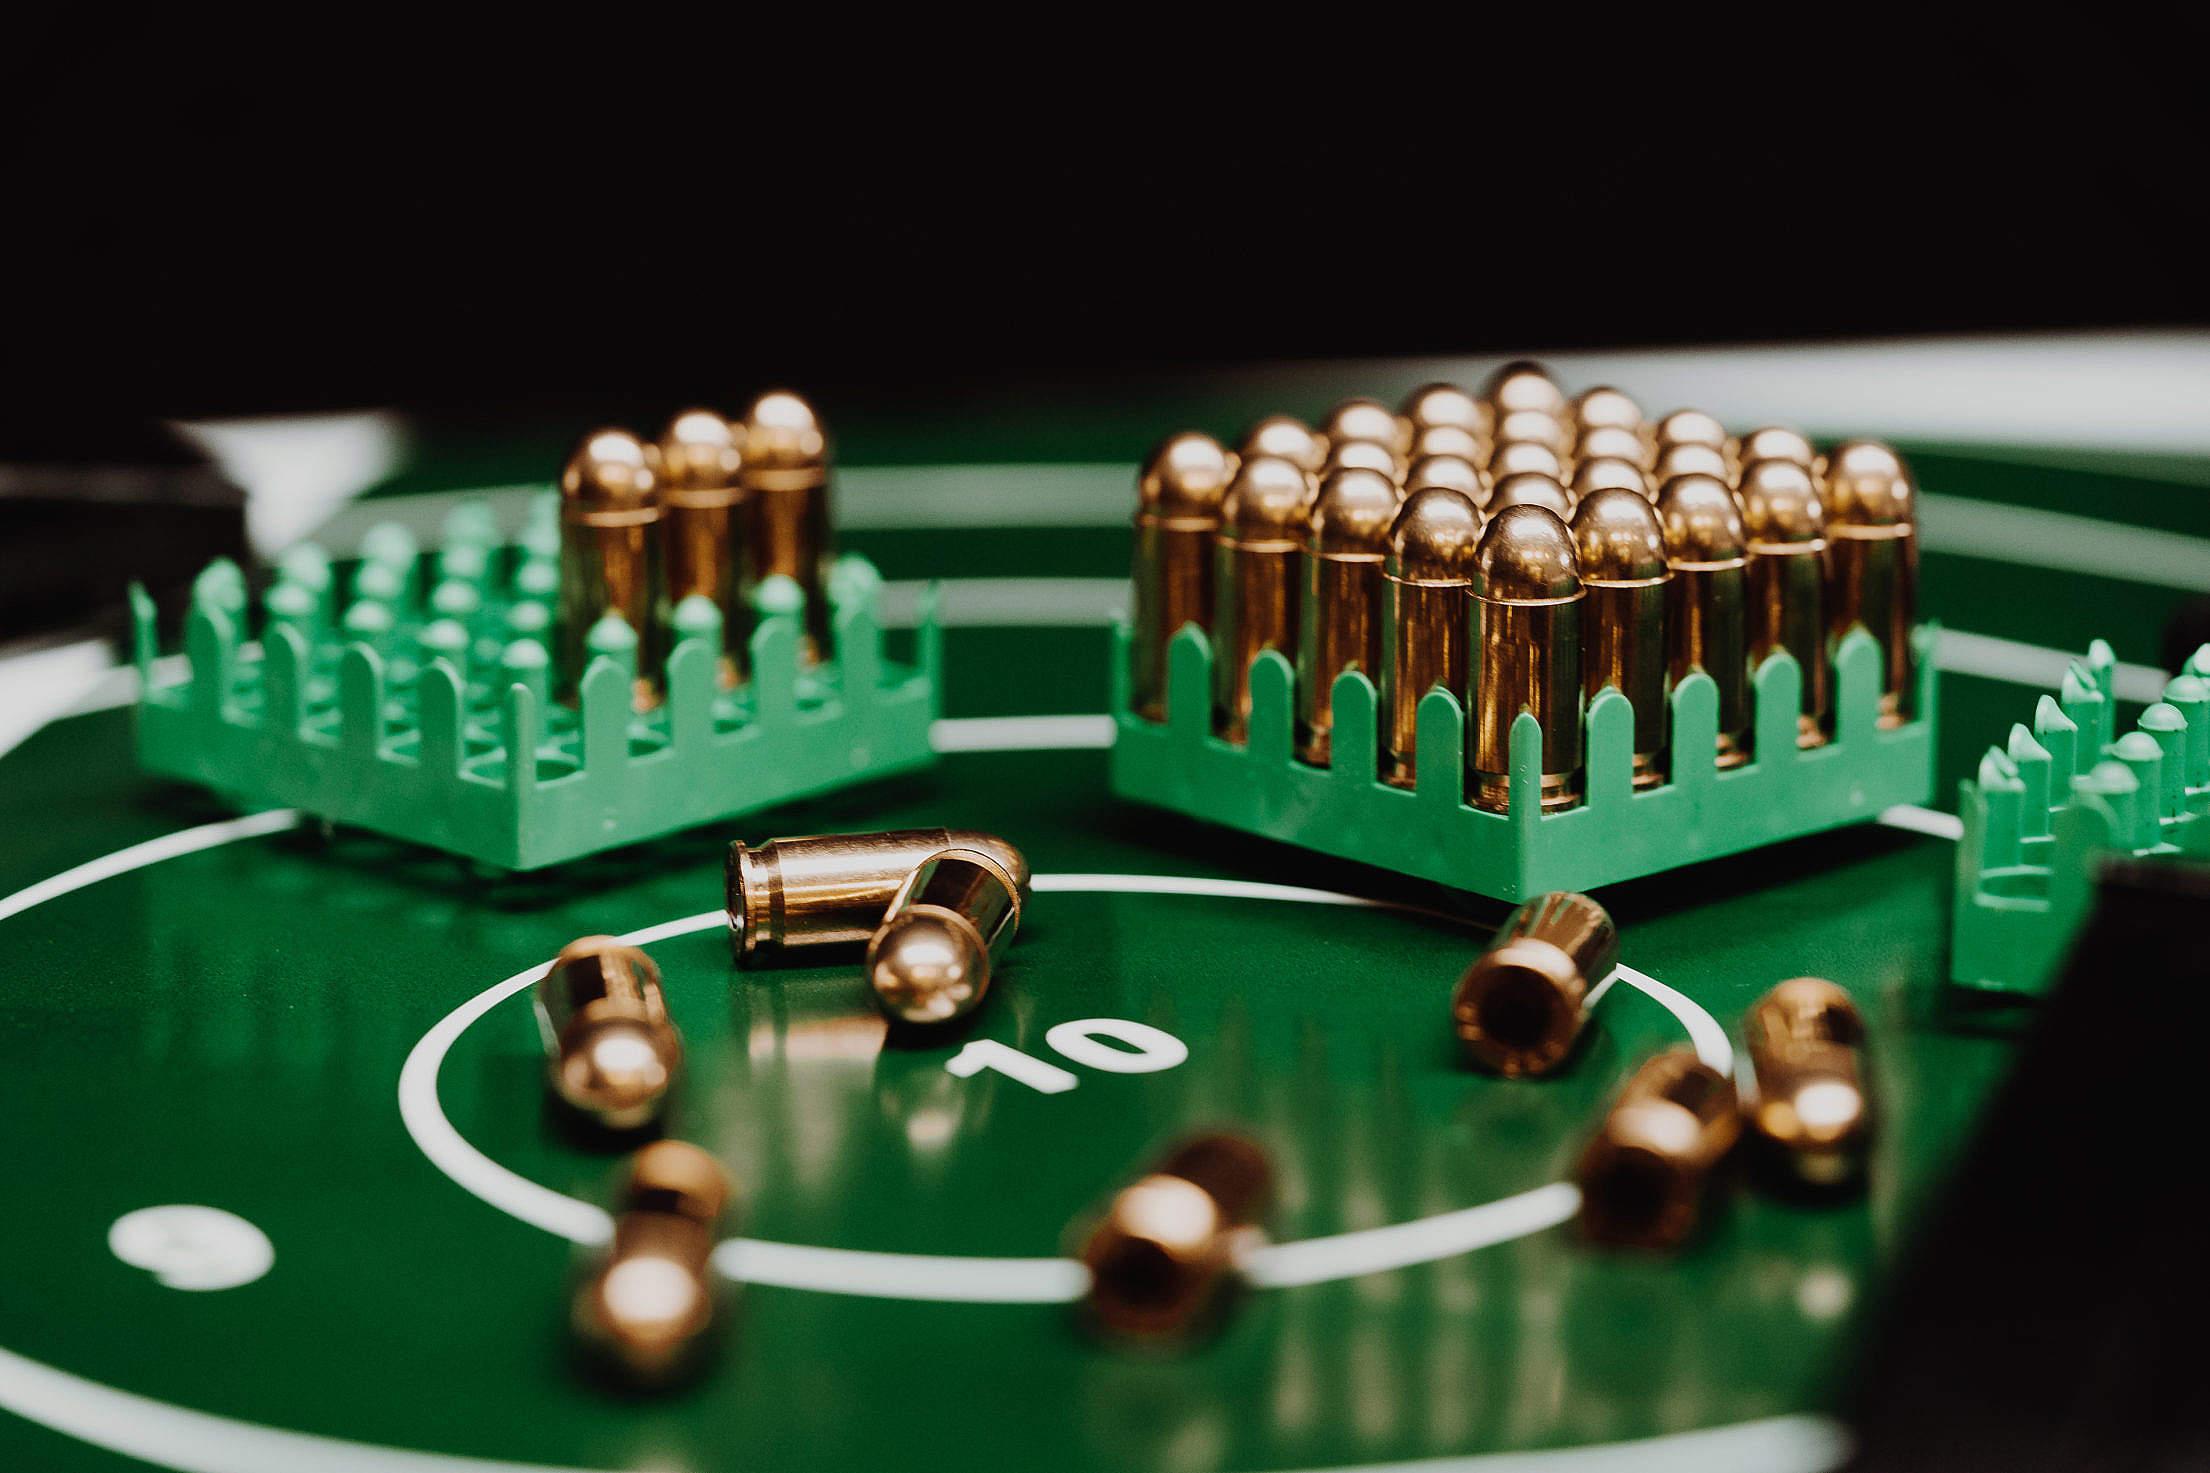 Target Full of Ammunition Free Stock Photo